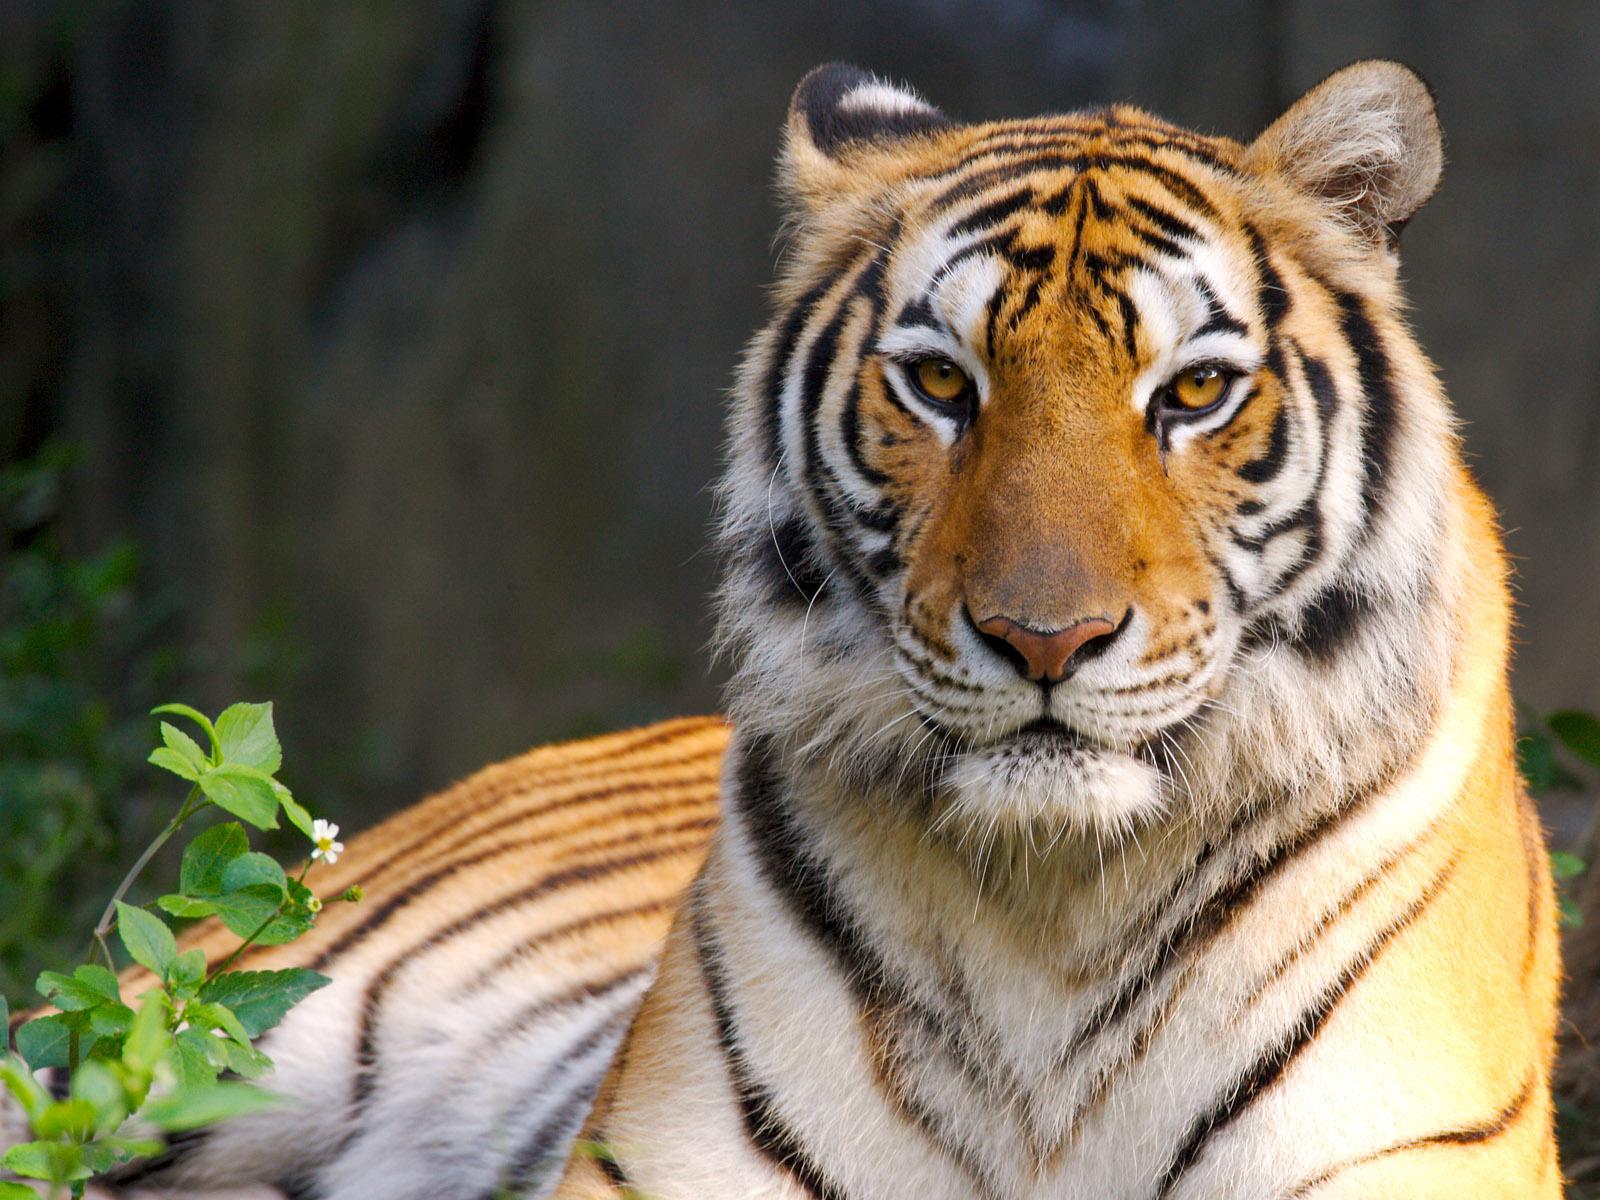 tigers indian tigers cute tigers tiger cu bs tigers photos wallpapers 1600x1200